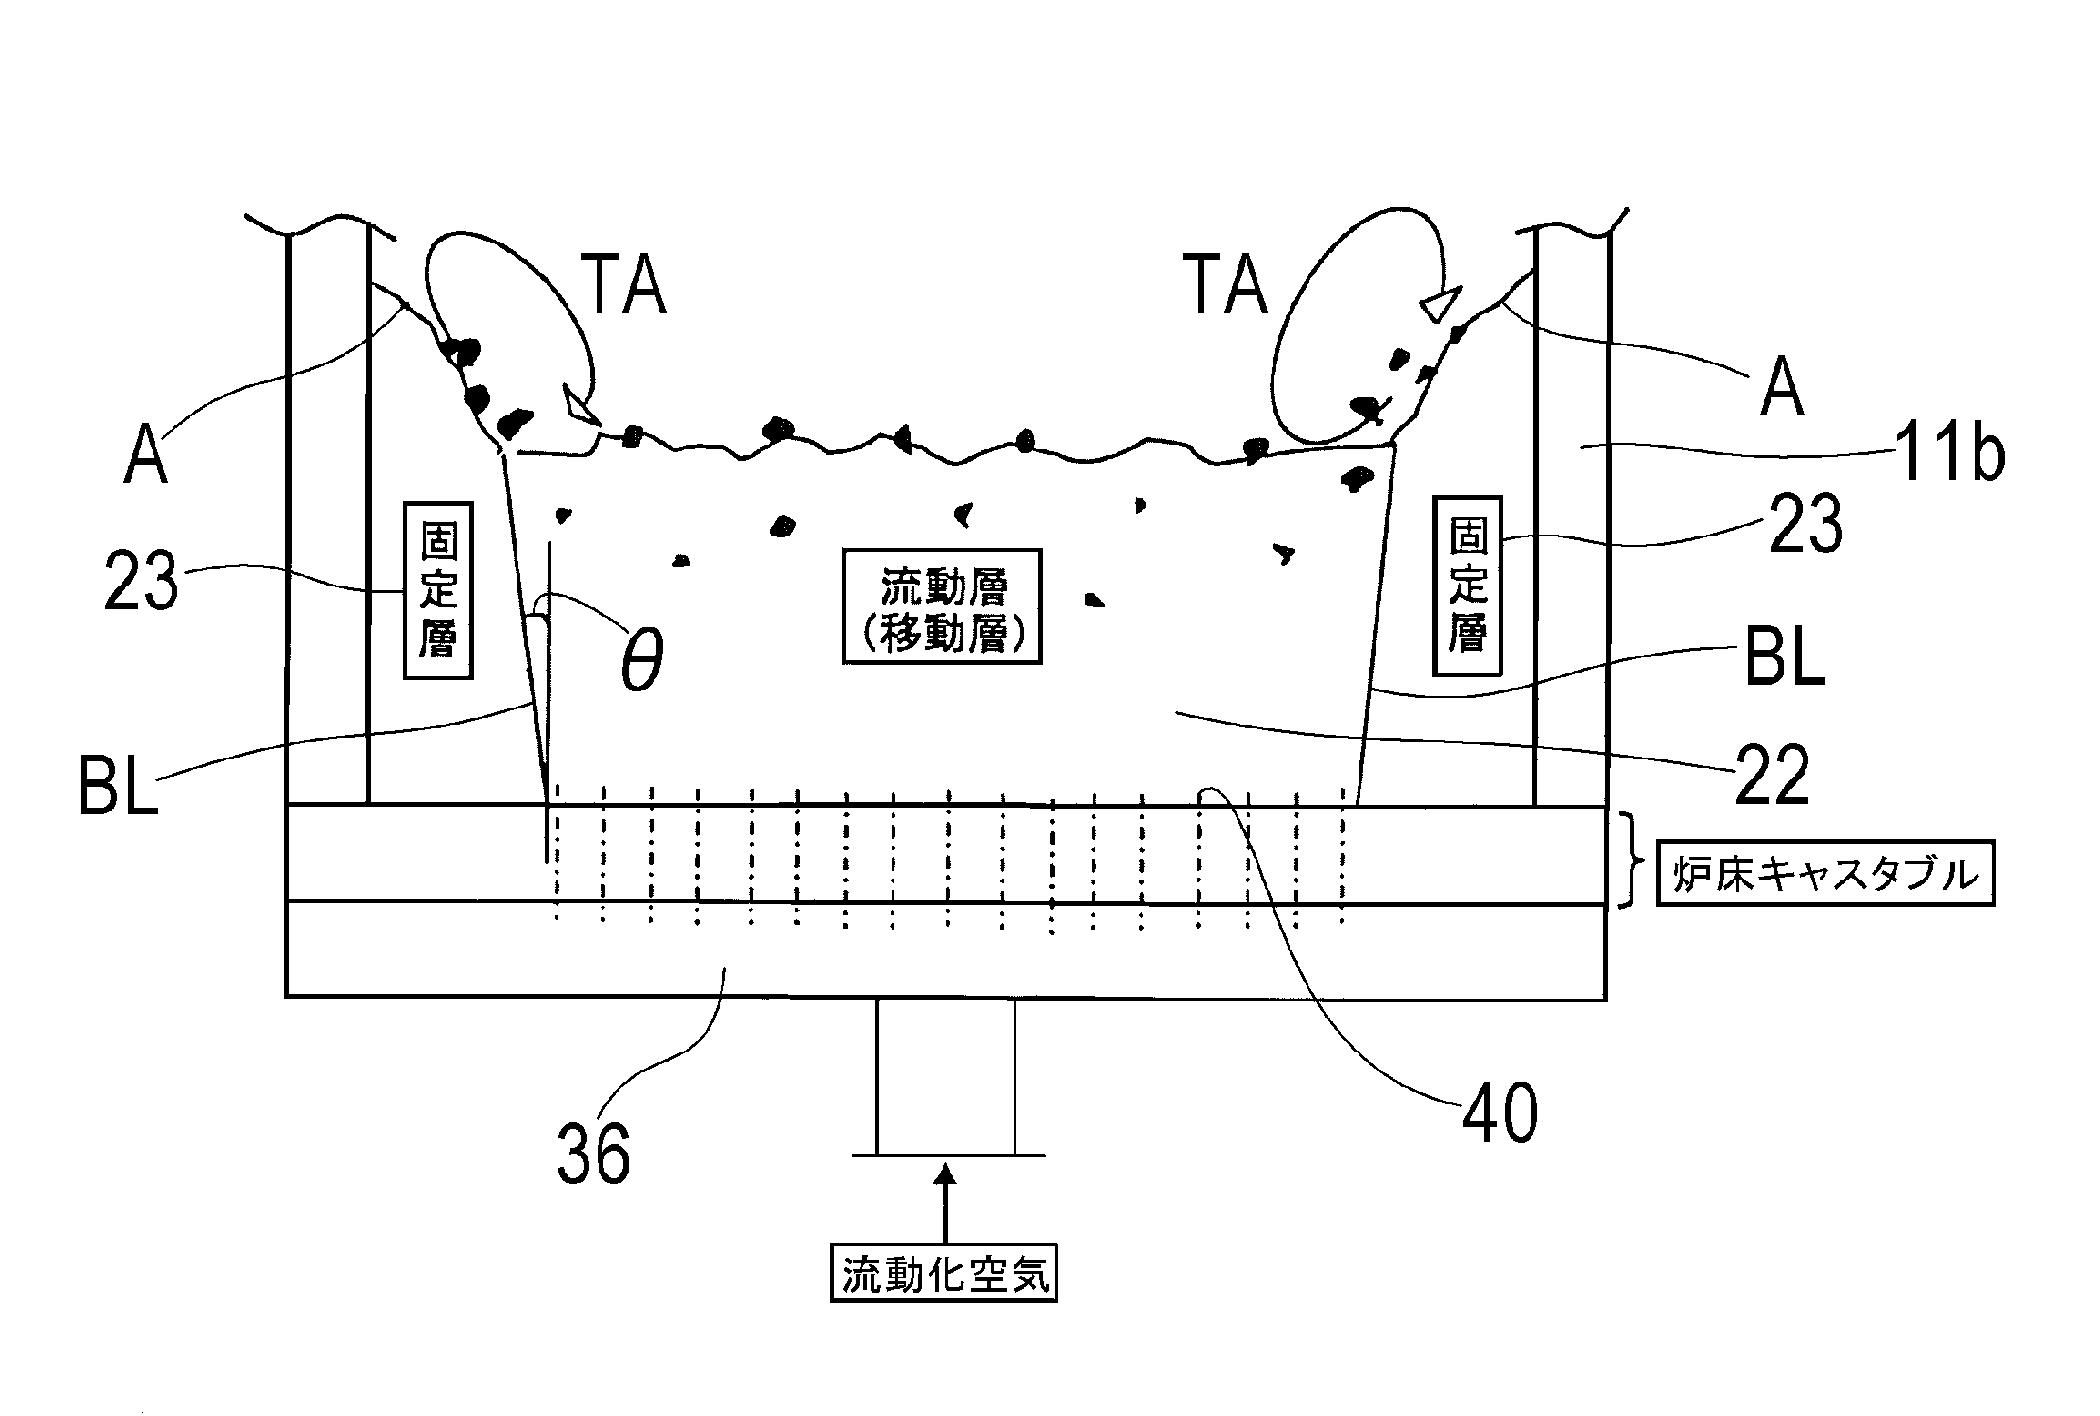 WO2013035615A1 - 流動床炉及び流動床炉を用いた廃棄物の処理方法         - Google PatentsFamily